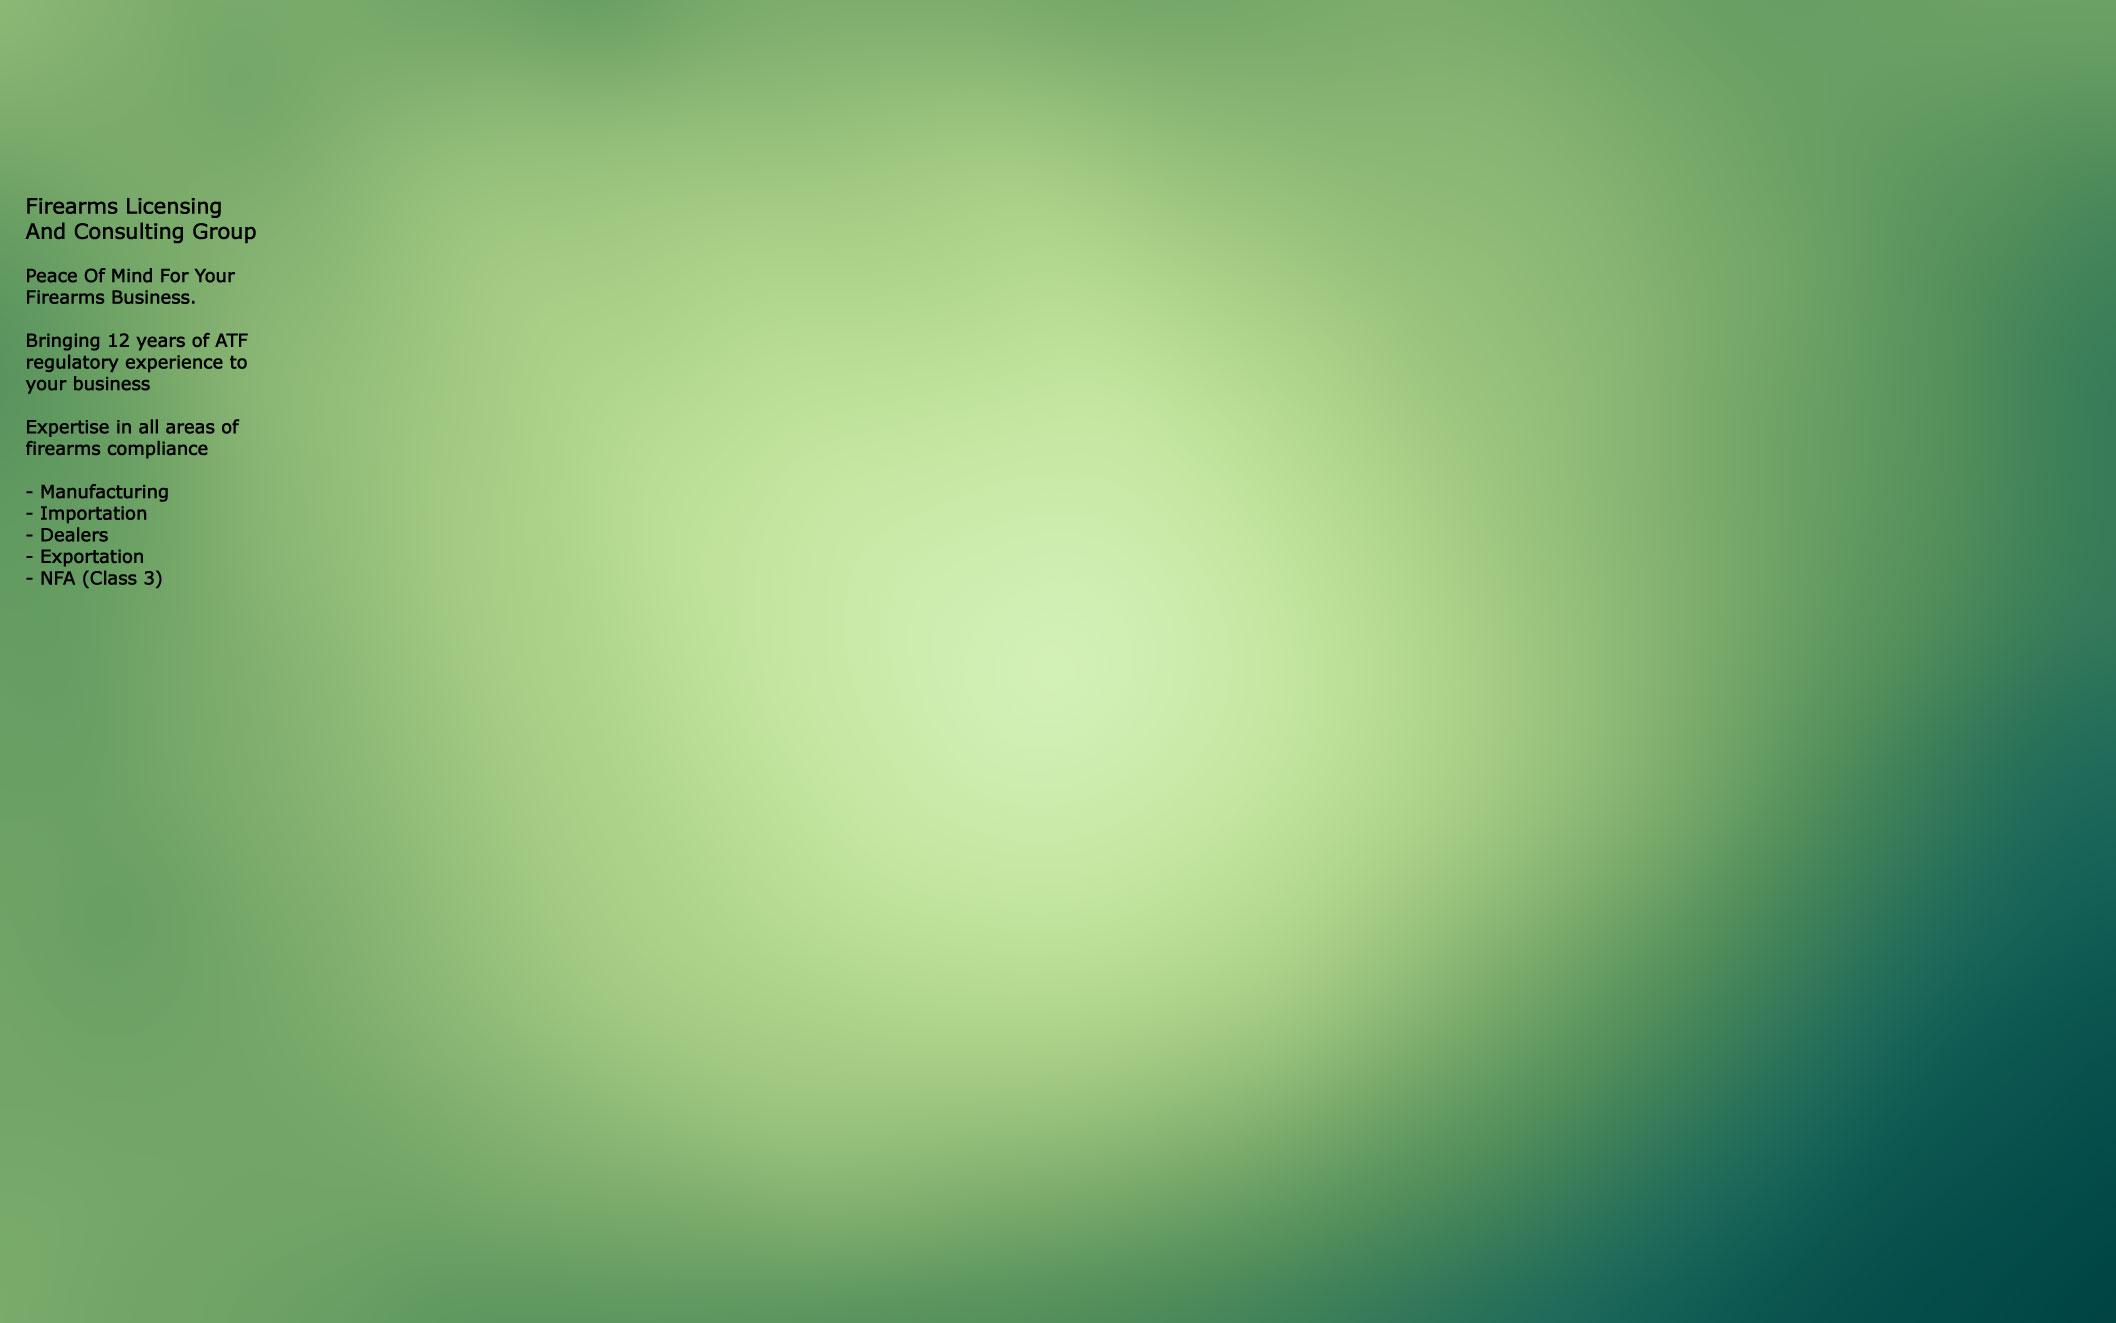 HD-Green-Background-July-23-2014-test-13.jpg